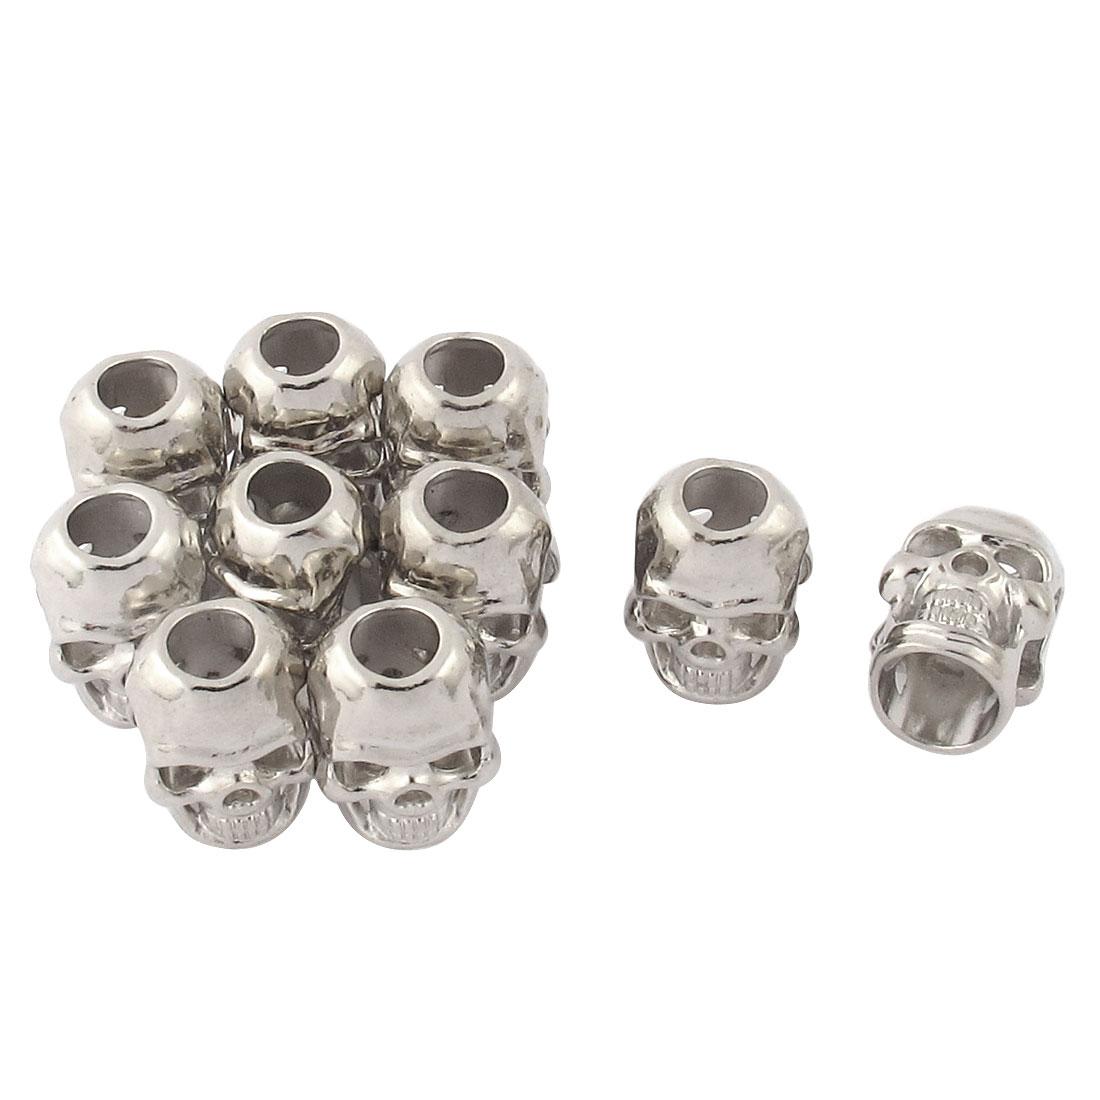 10 Pcs Silver Tone Skull Head Shape Mini Pendant Charm Bead DIY Jewelry